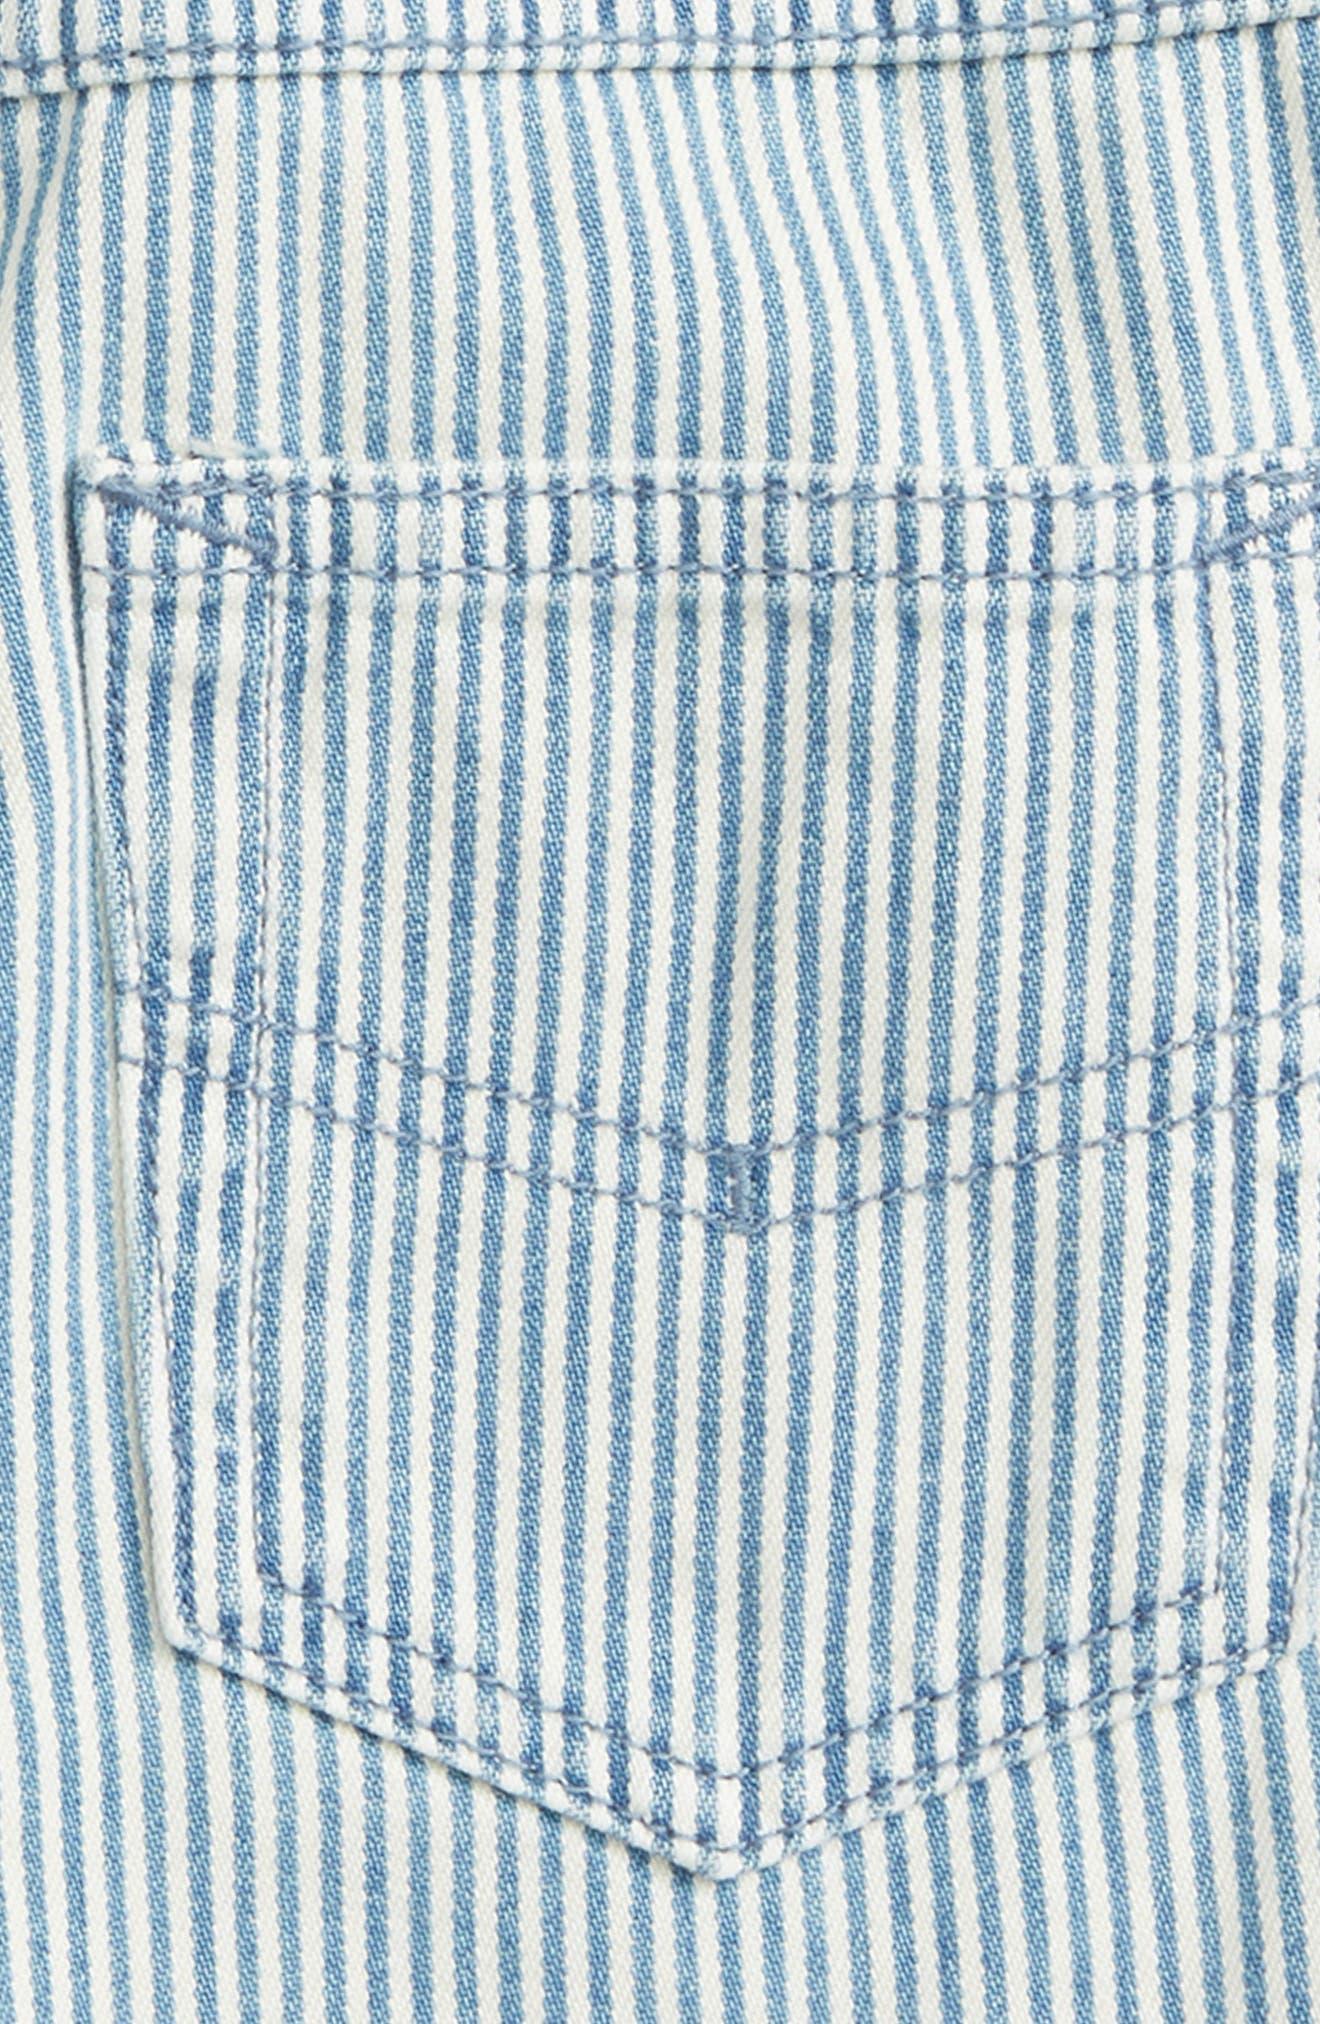 Stripe Shorts,                             Alternate thumbnail 3, color,                             Sanford Wash